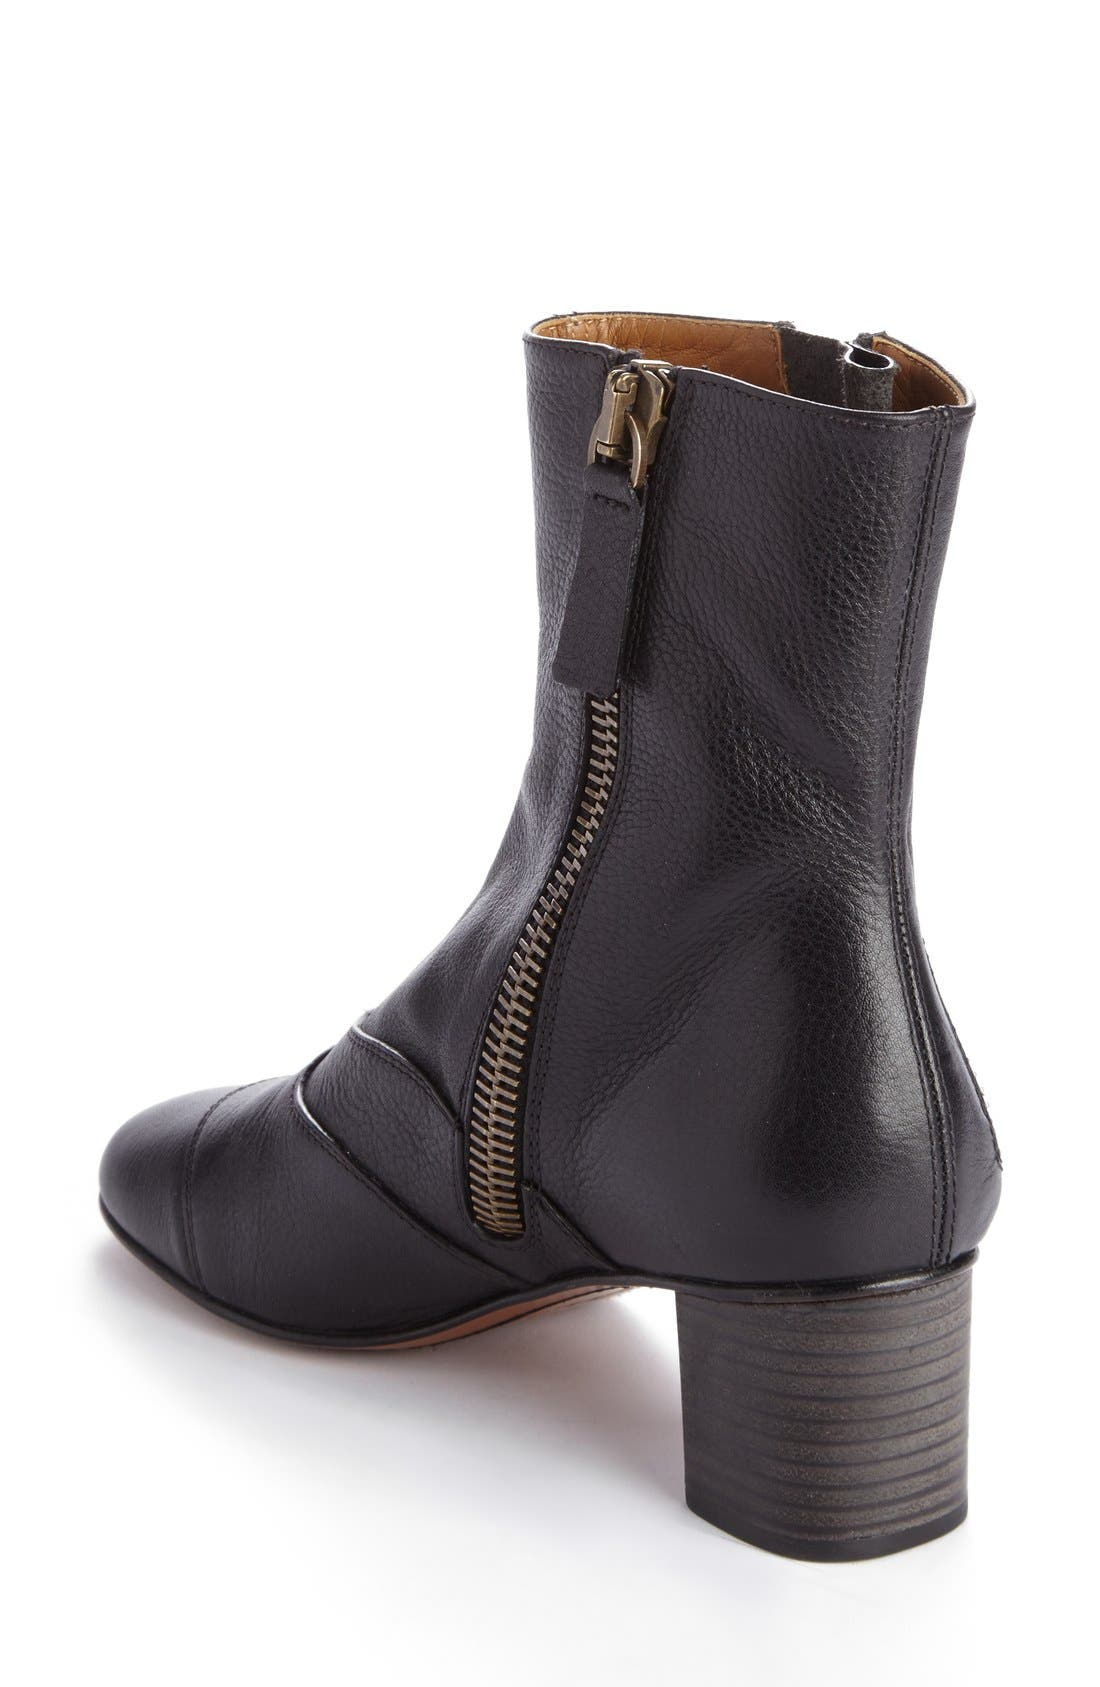 'Lexie' Block Heel Boot,                             Alternate thumbnail 2, color,                             Black Leather